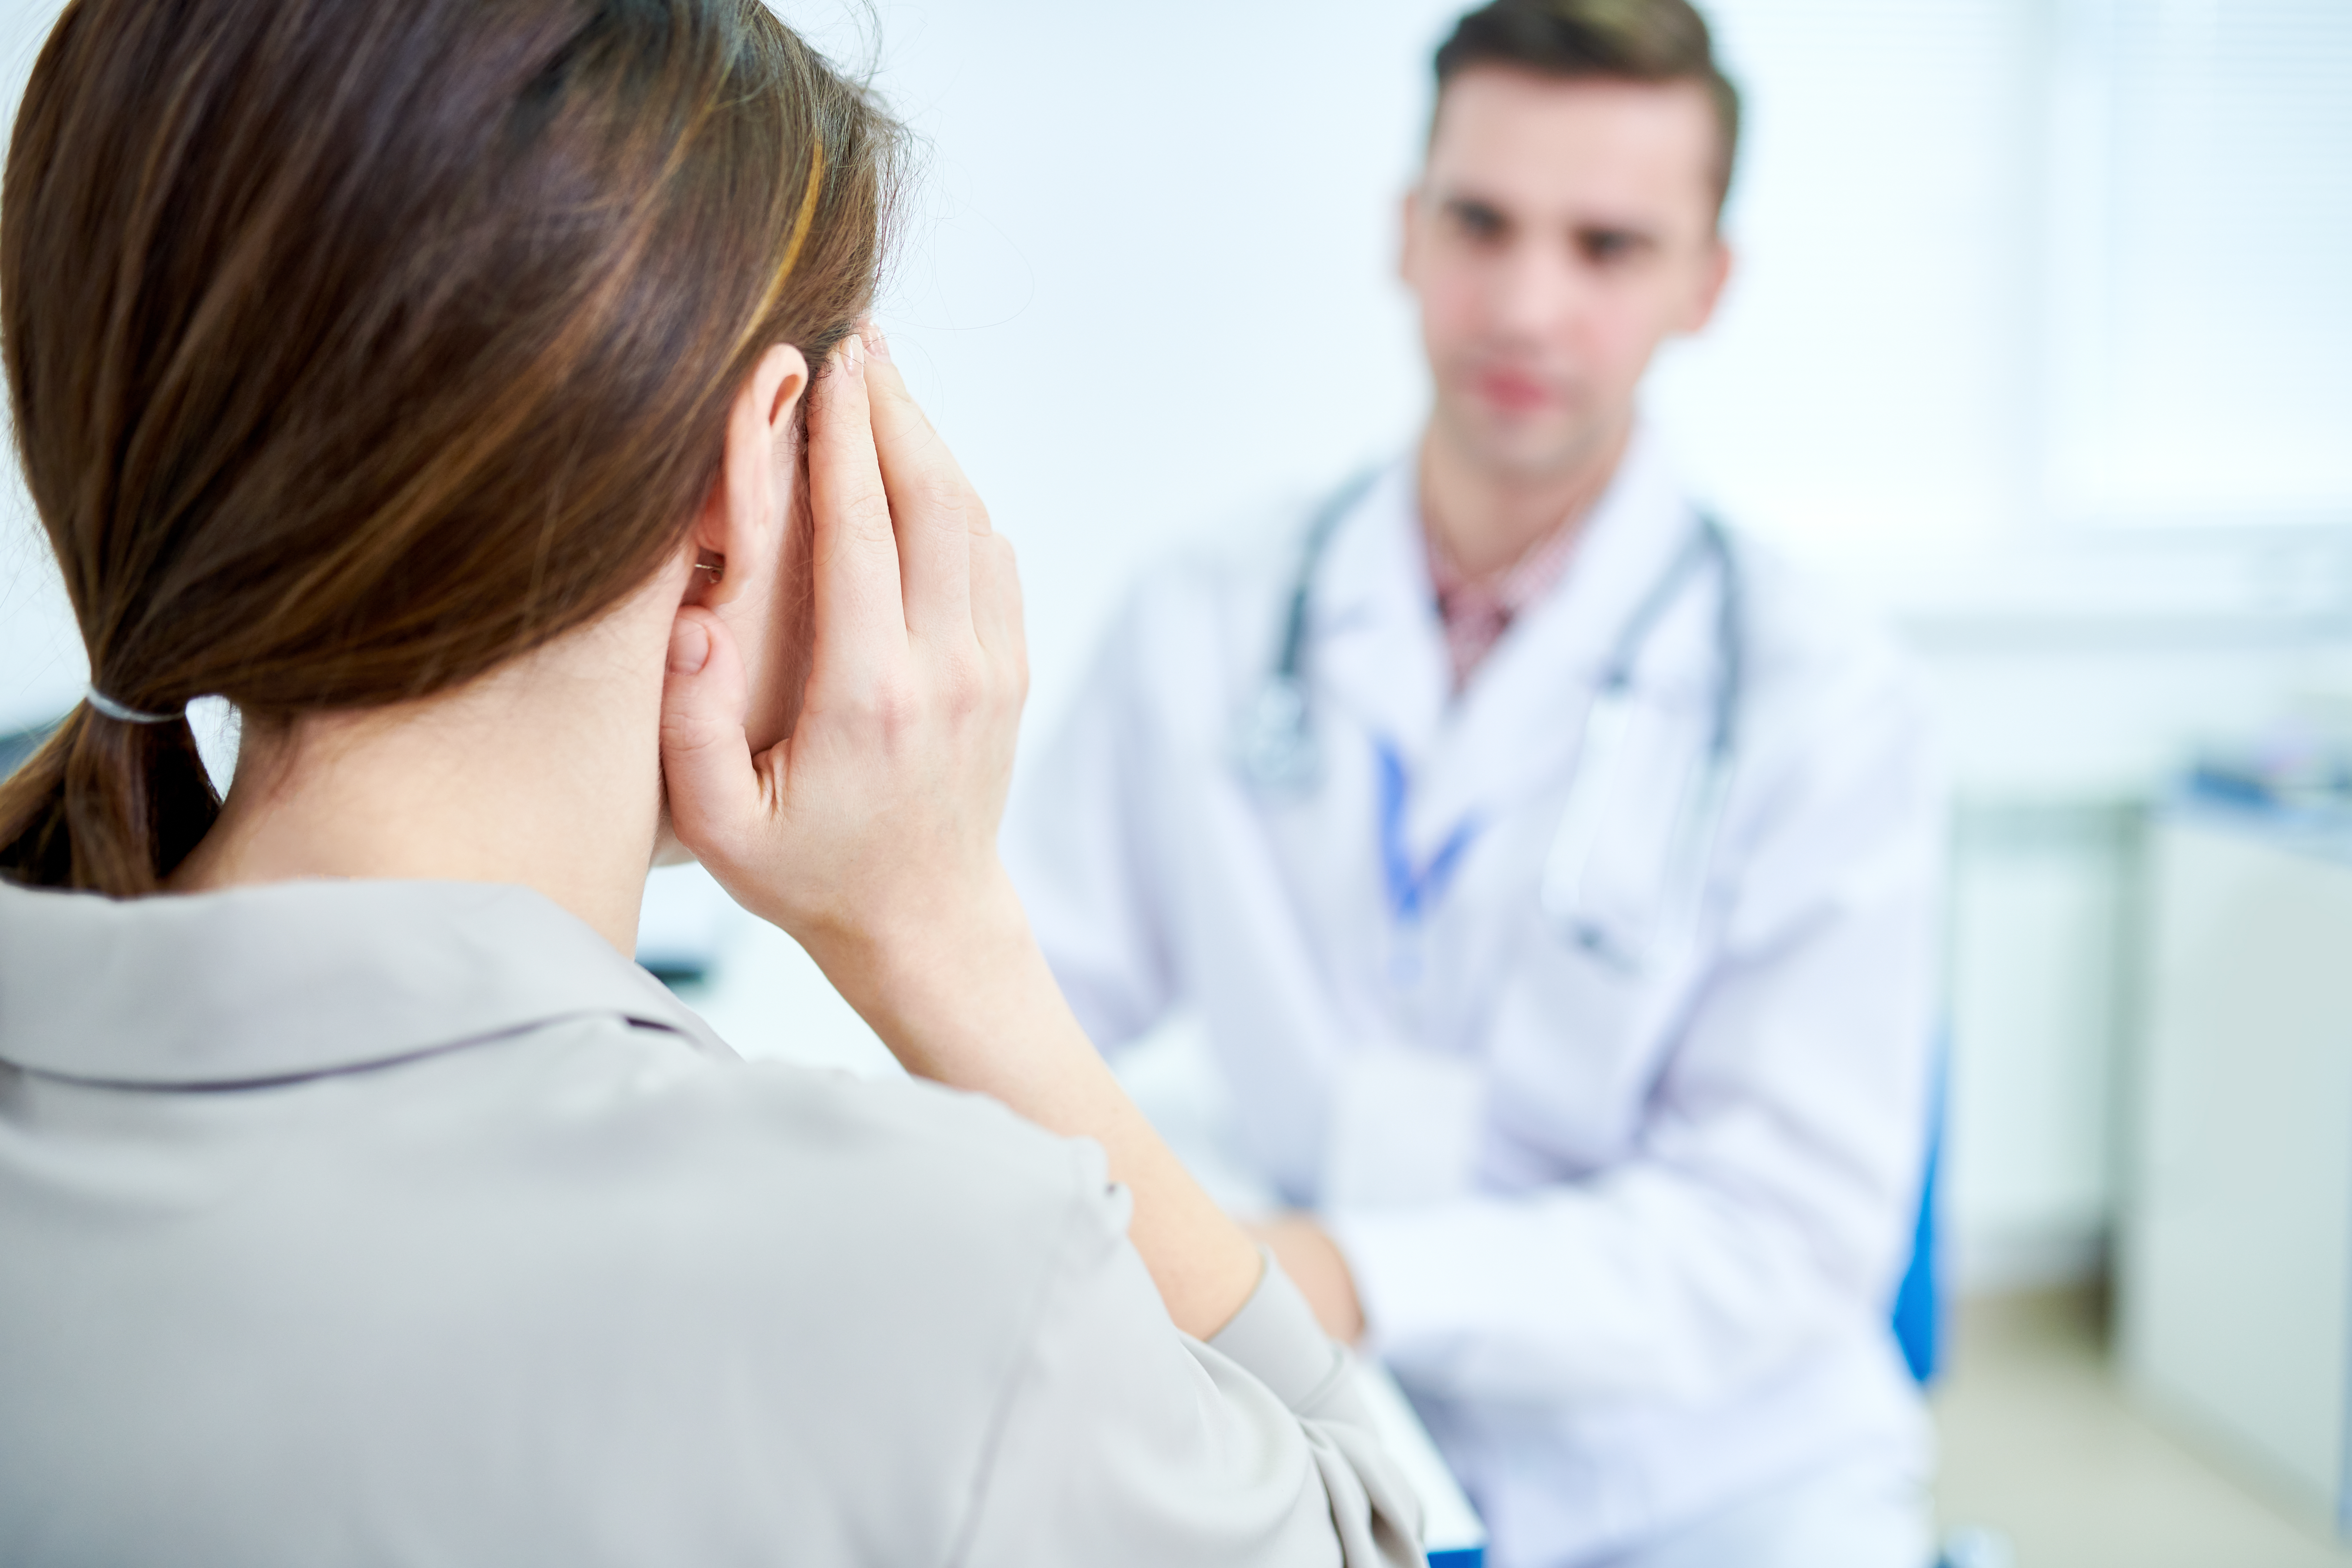 woman-suffering-from-earache-CUL8V2R (1)